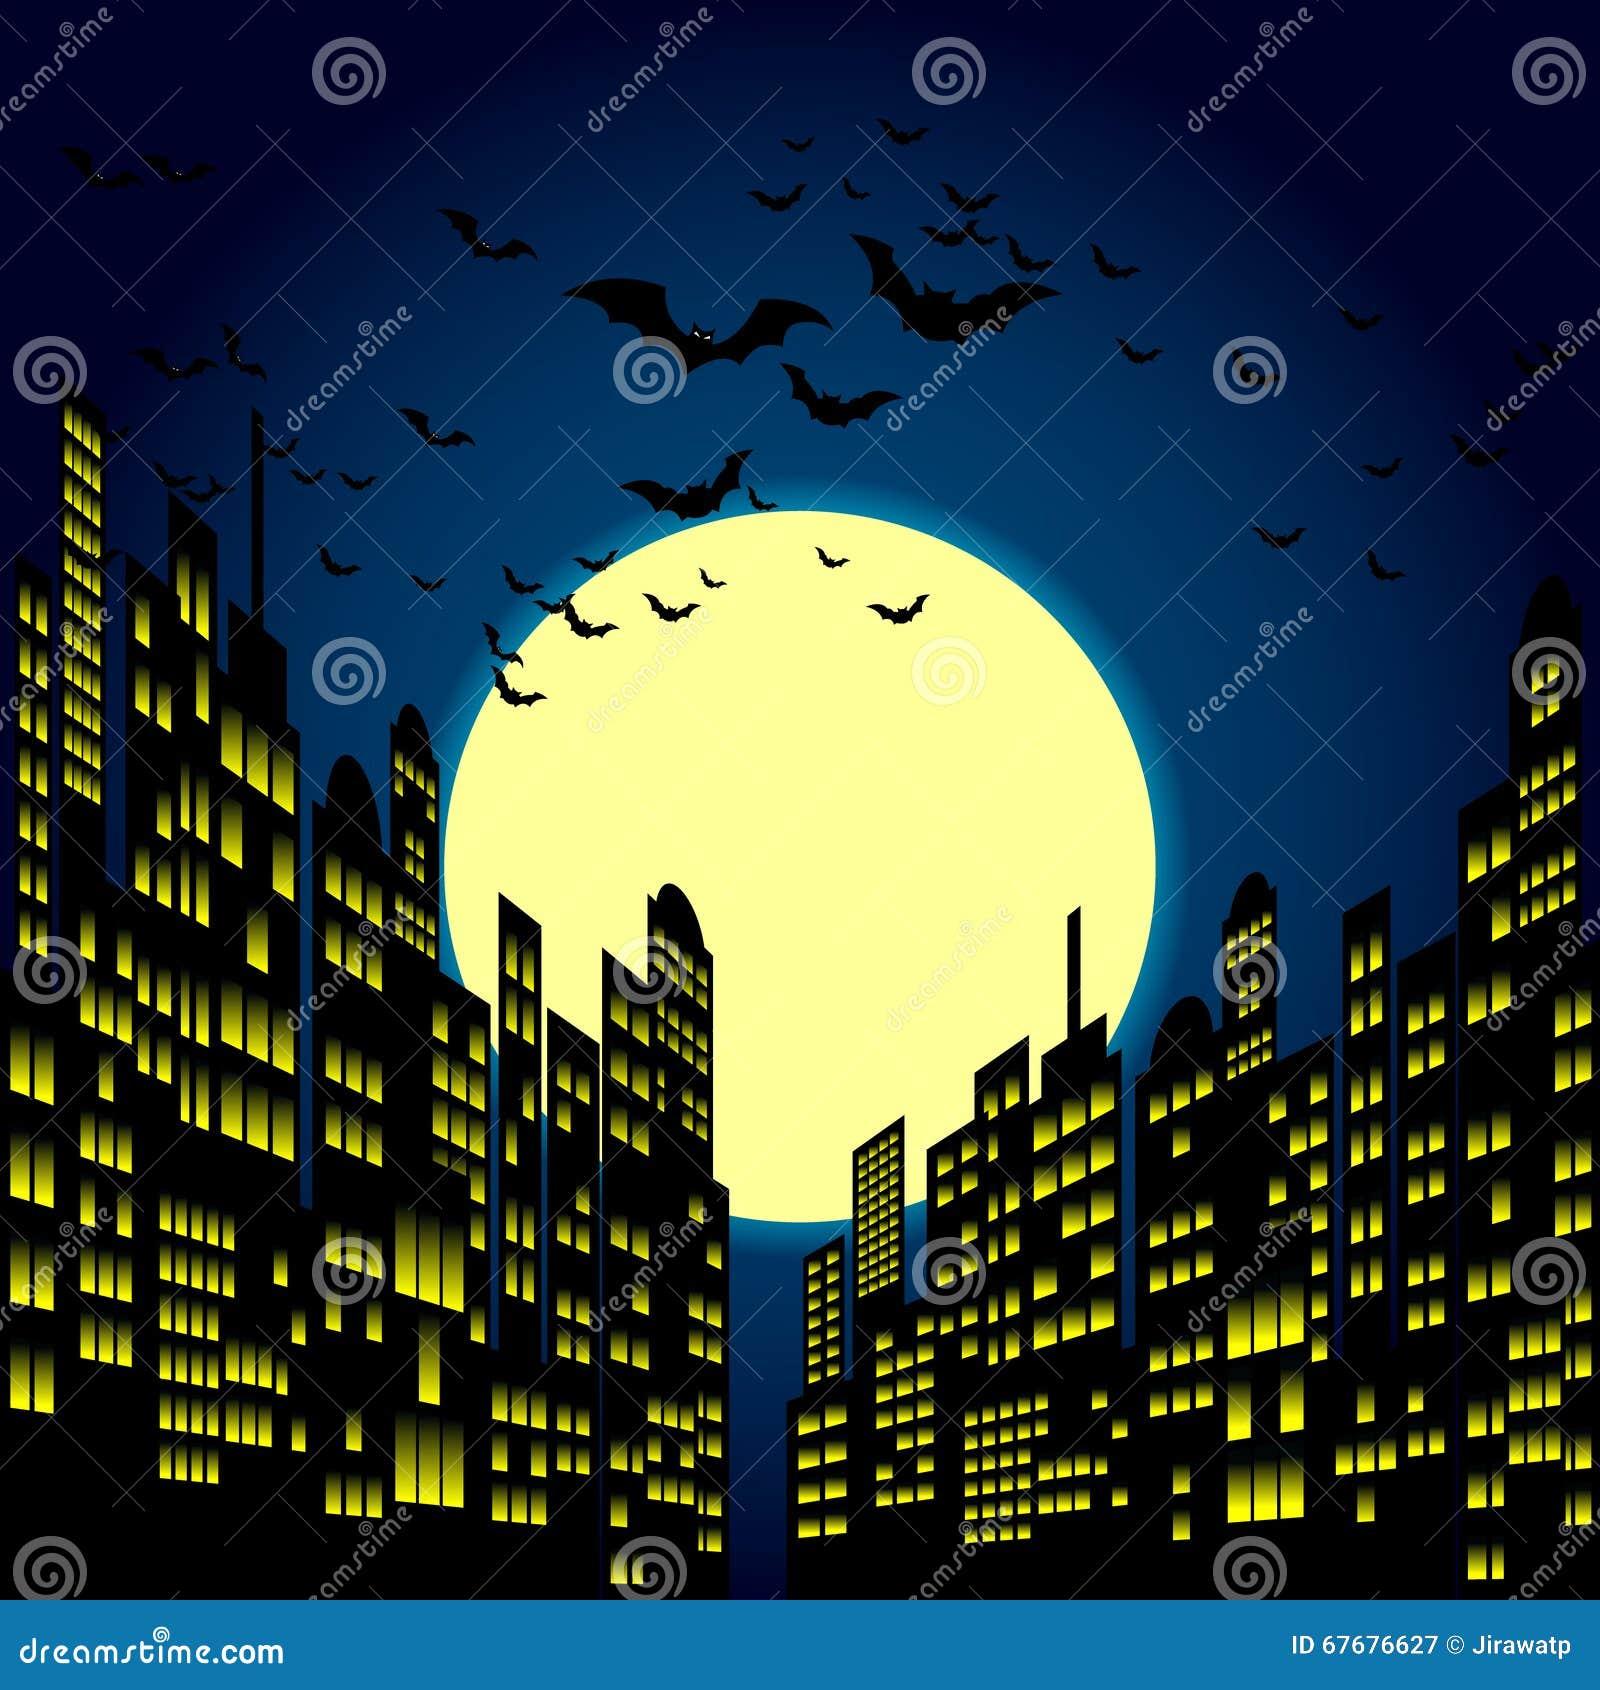 cartoon night vector wallpaper - photo #16